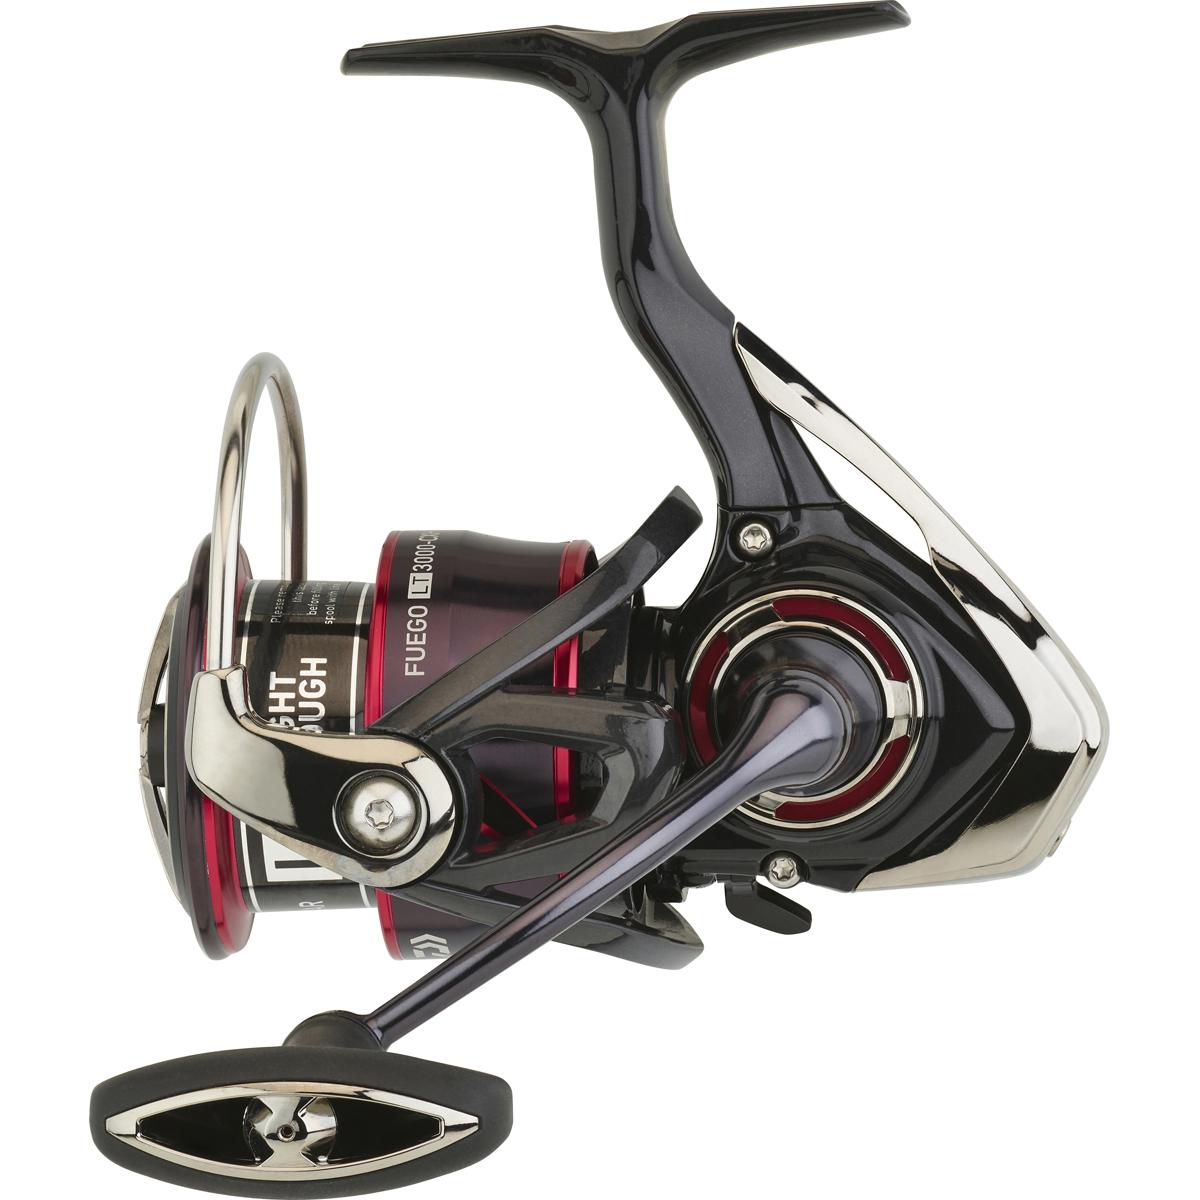 fuego moulinet spinning de daiwa 2020 LT pêche fishing